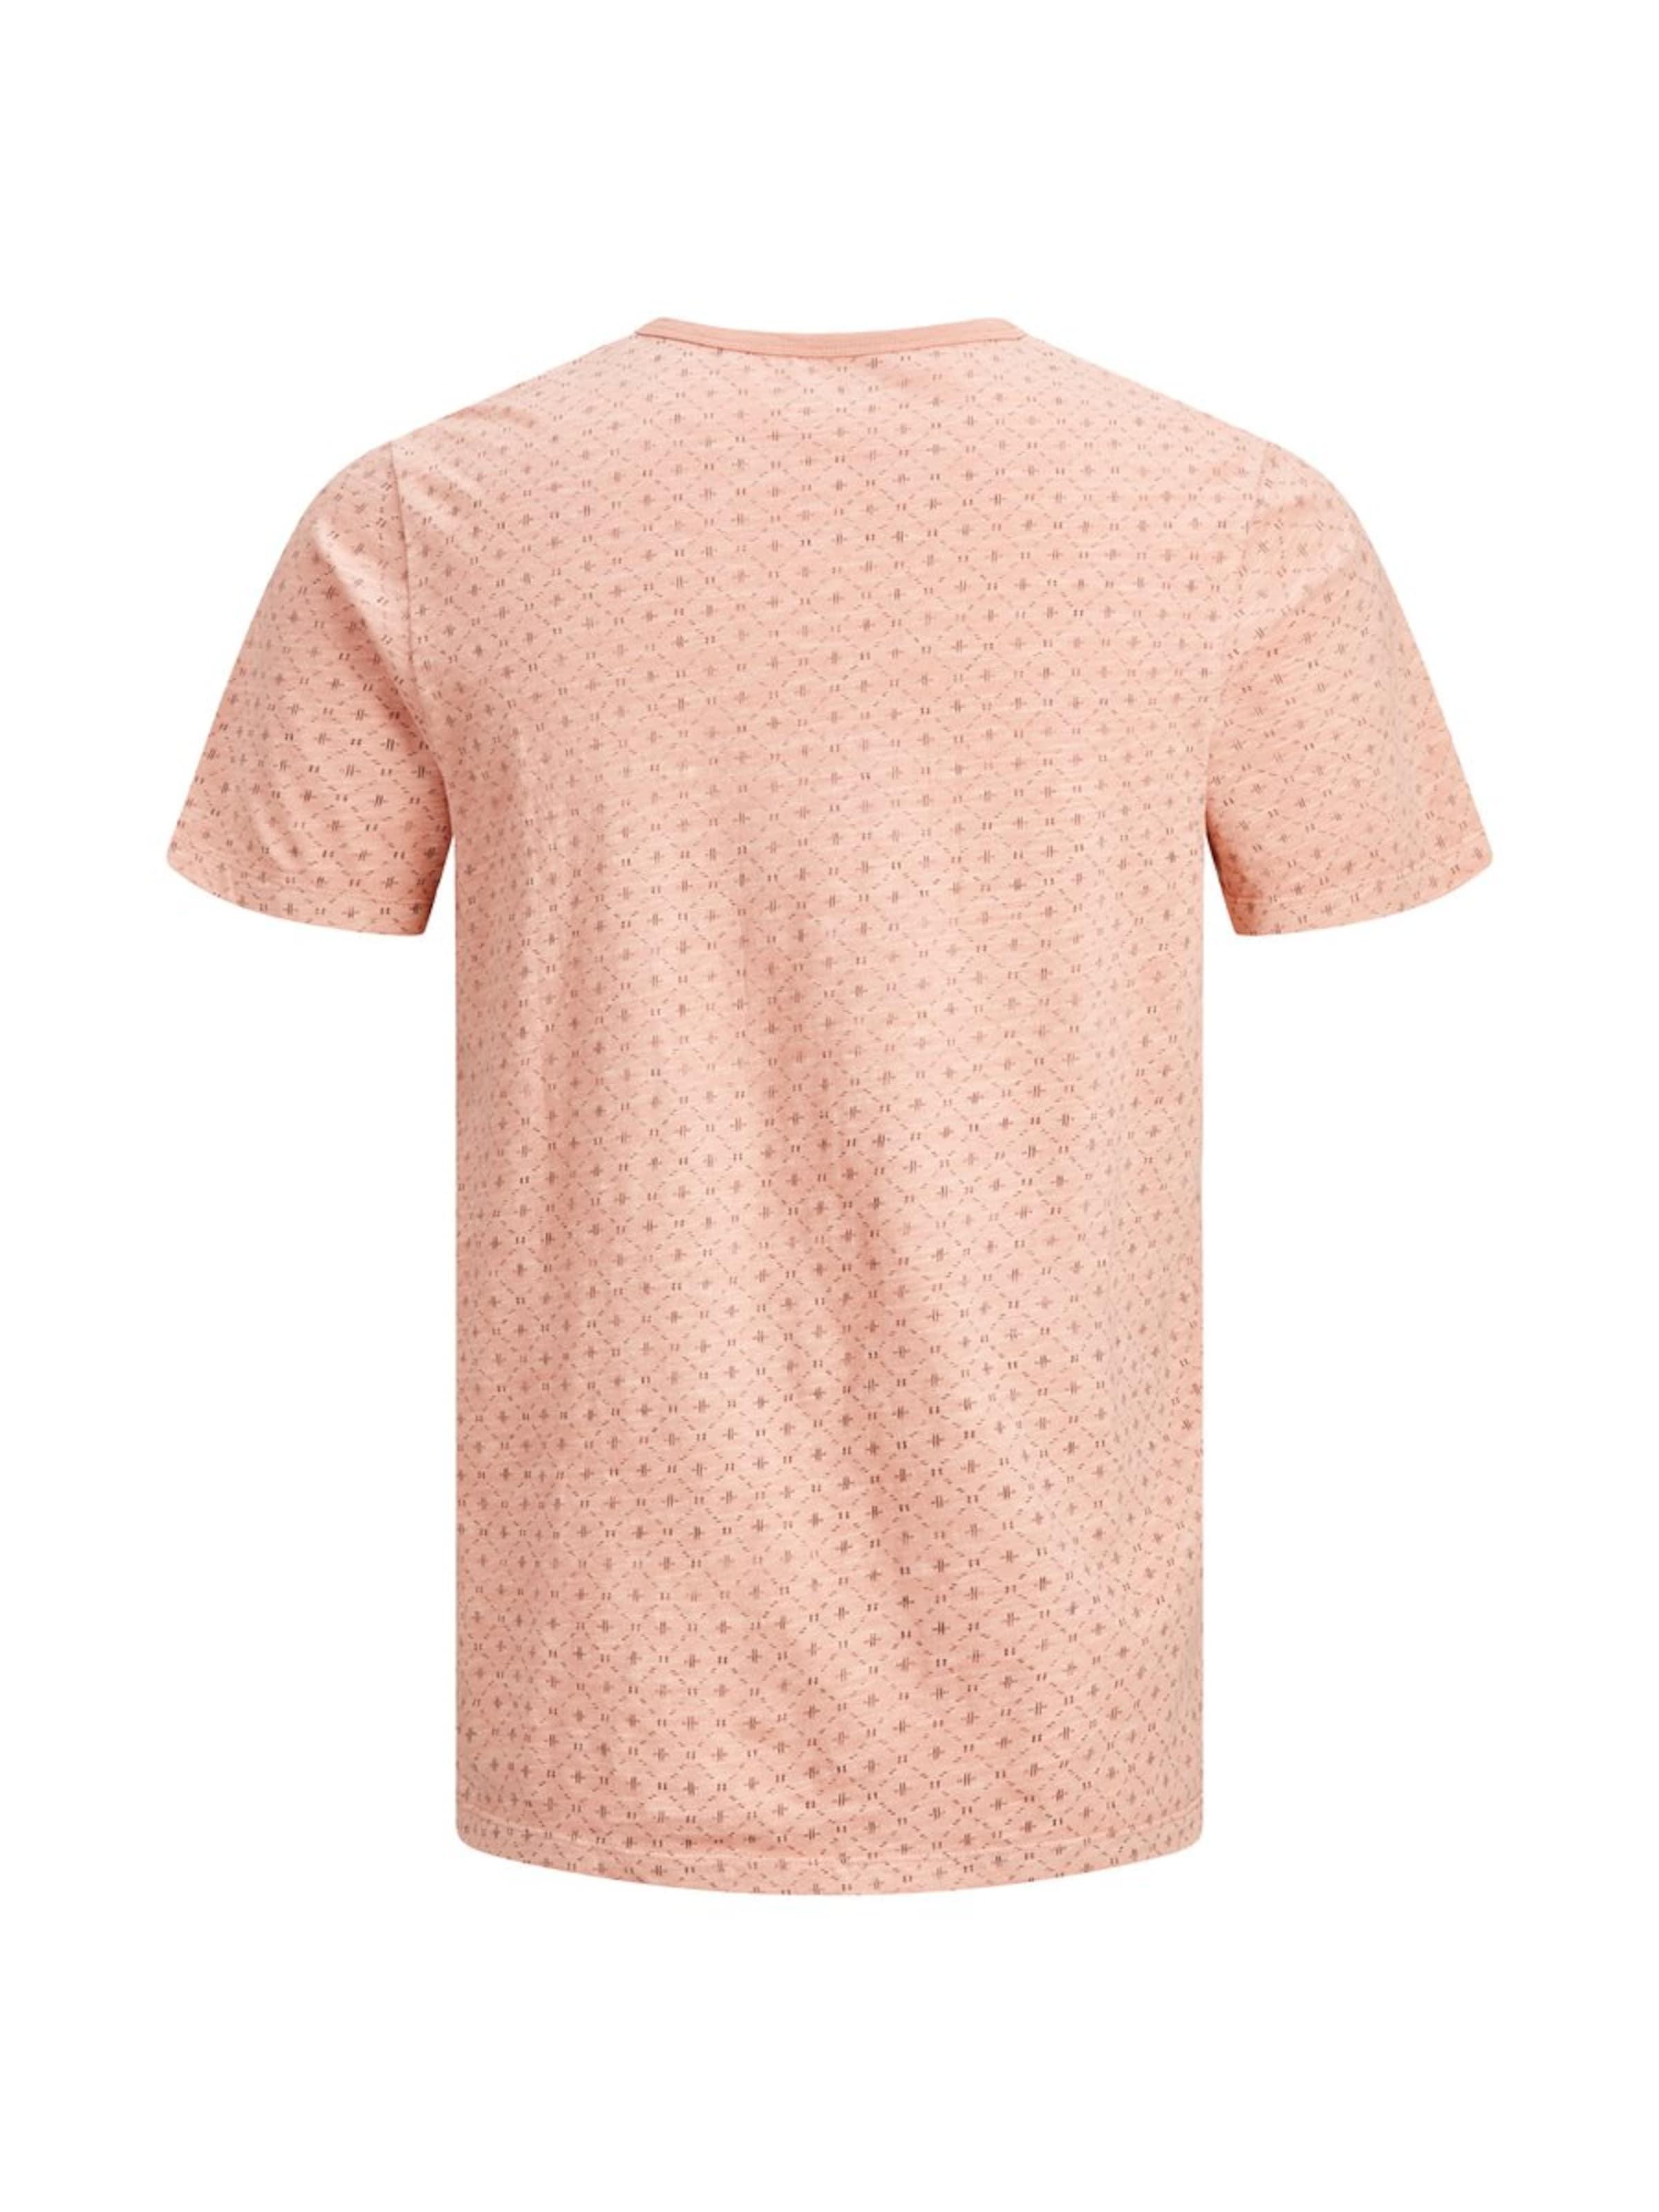 shirt Jones Lachs Jackamp; T In TlFKcu1J35